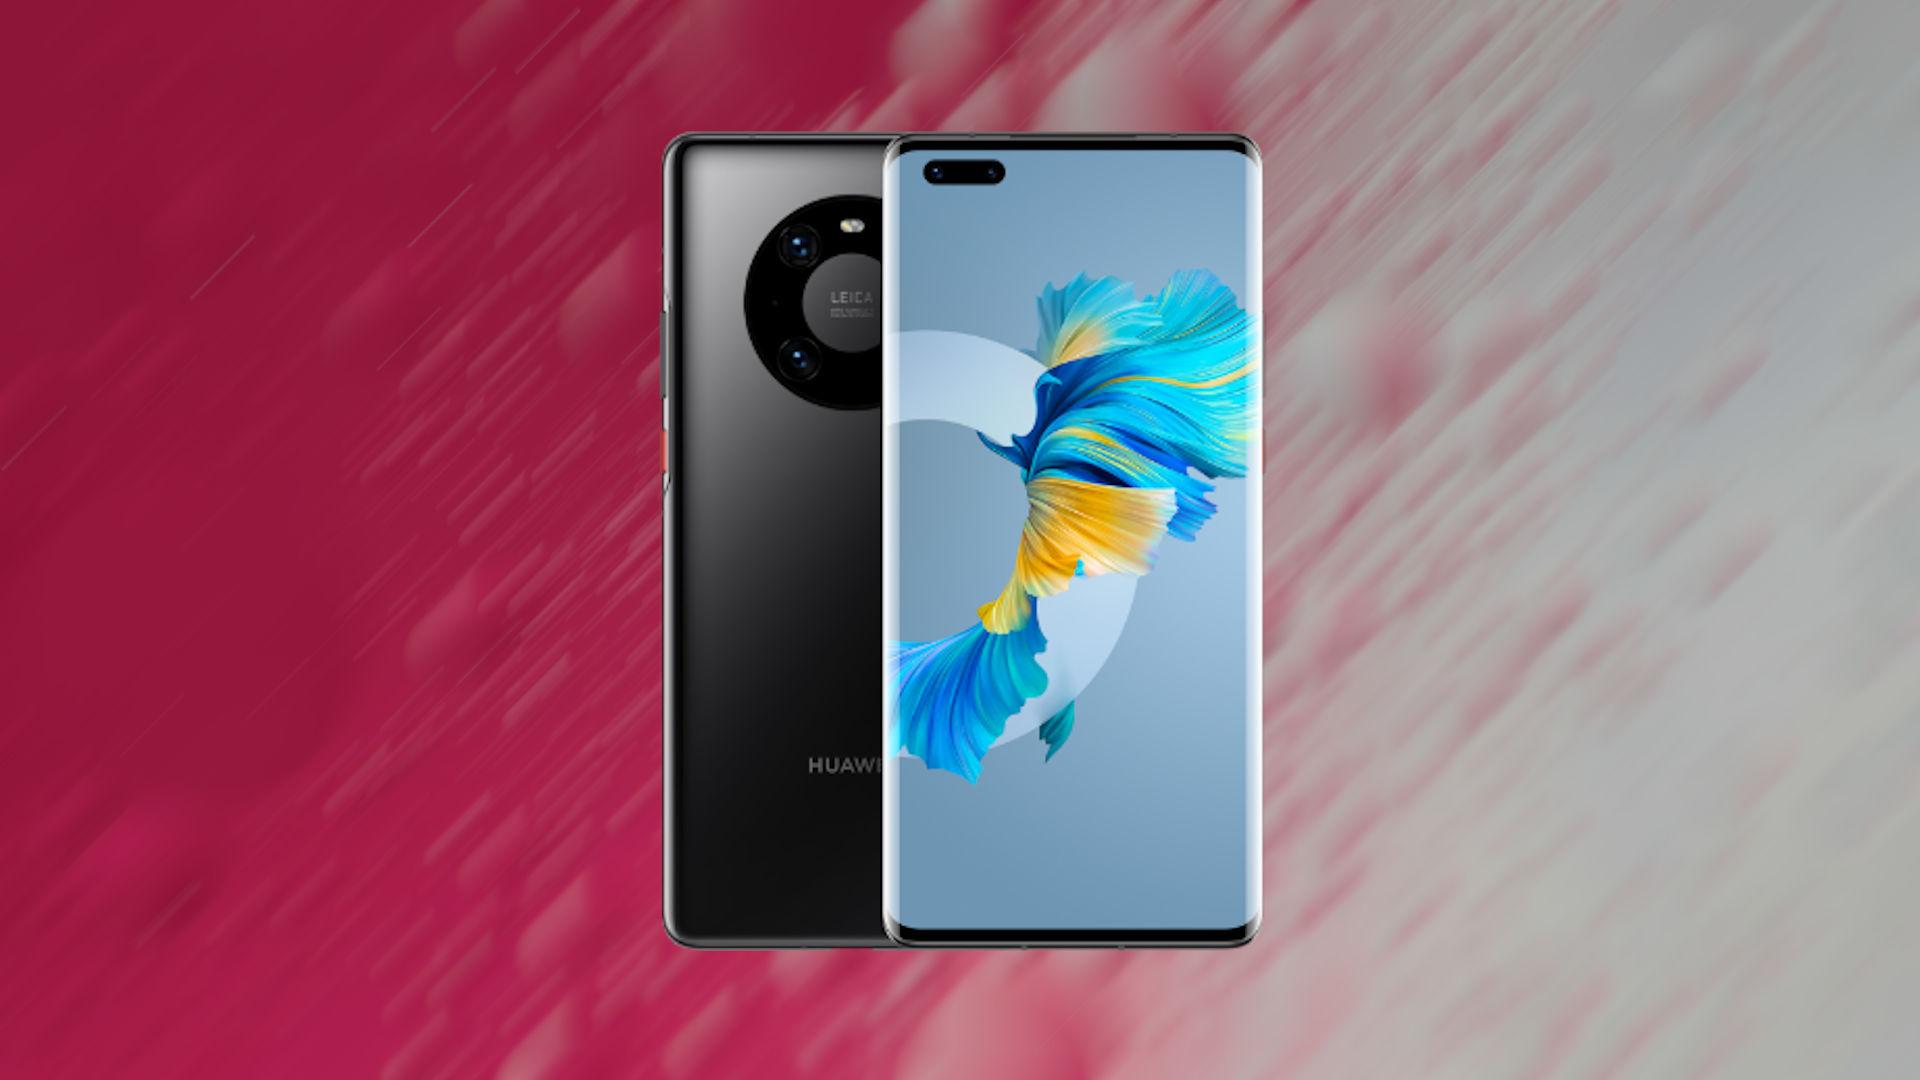 Huawei Mate 40 Pro Mejores Carátulas Películas Y Accesorios Gizchina It